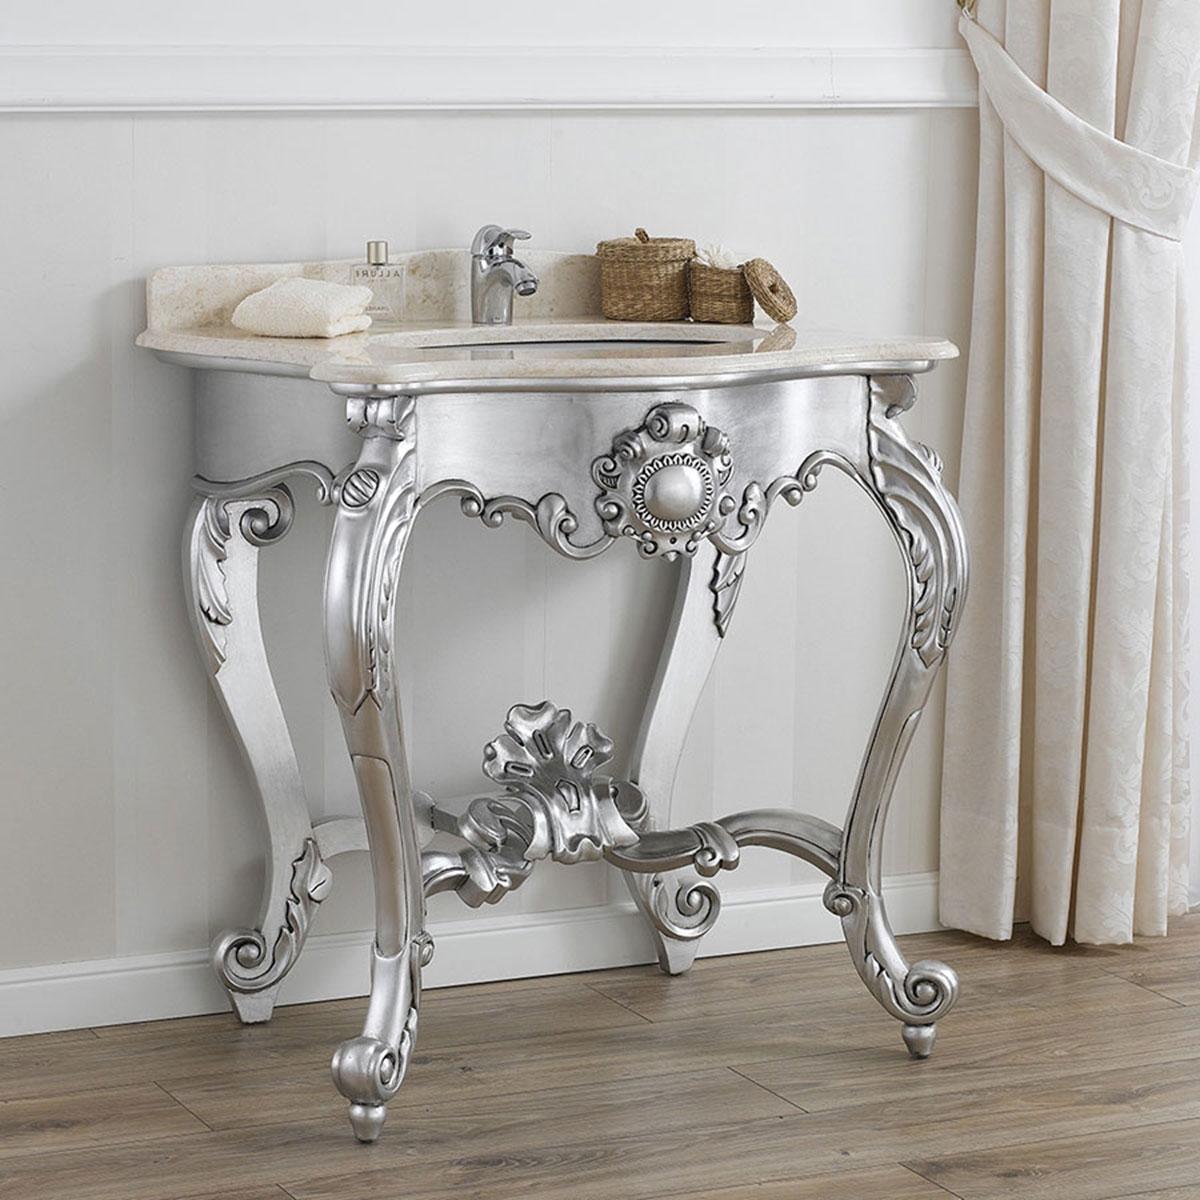 console meuble salle de bain luigi filippo style baroque moderne feuille argent ebay. Black Bedroom Furniture Sets. Home Design Ideas